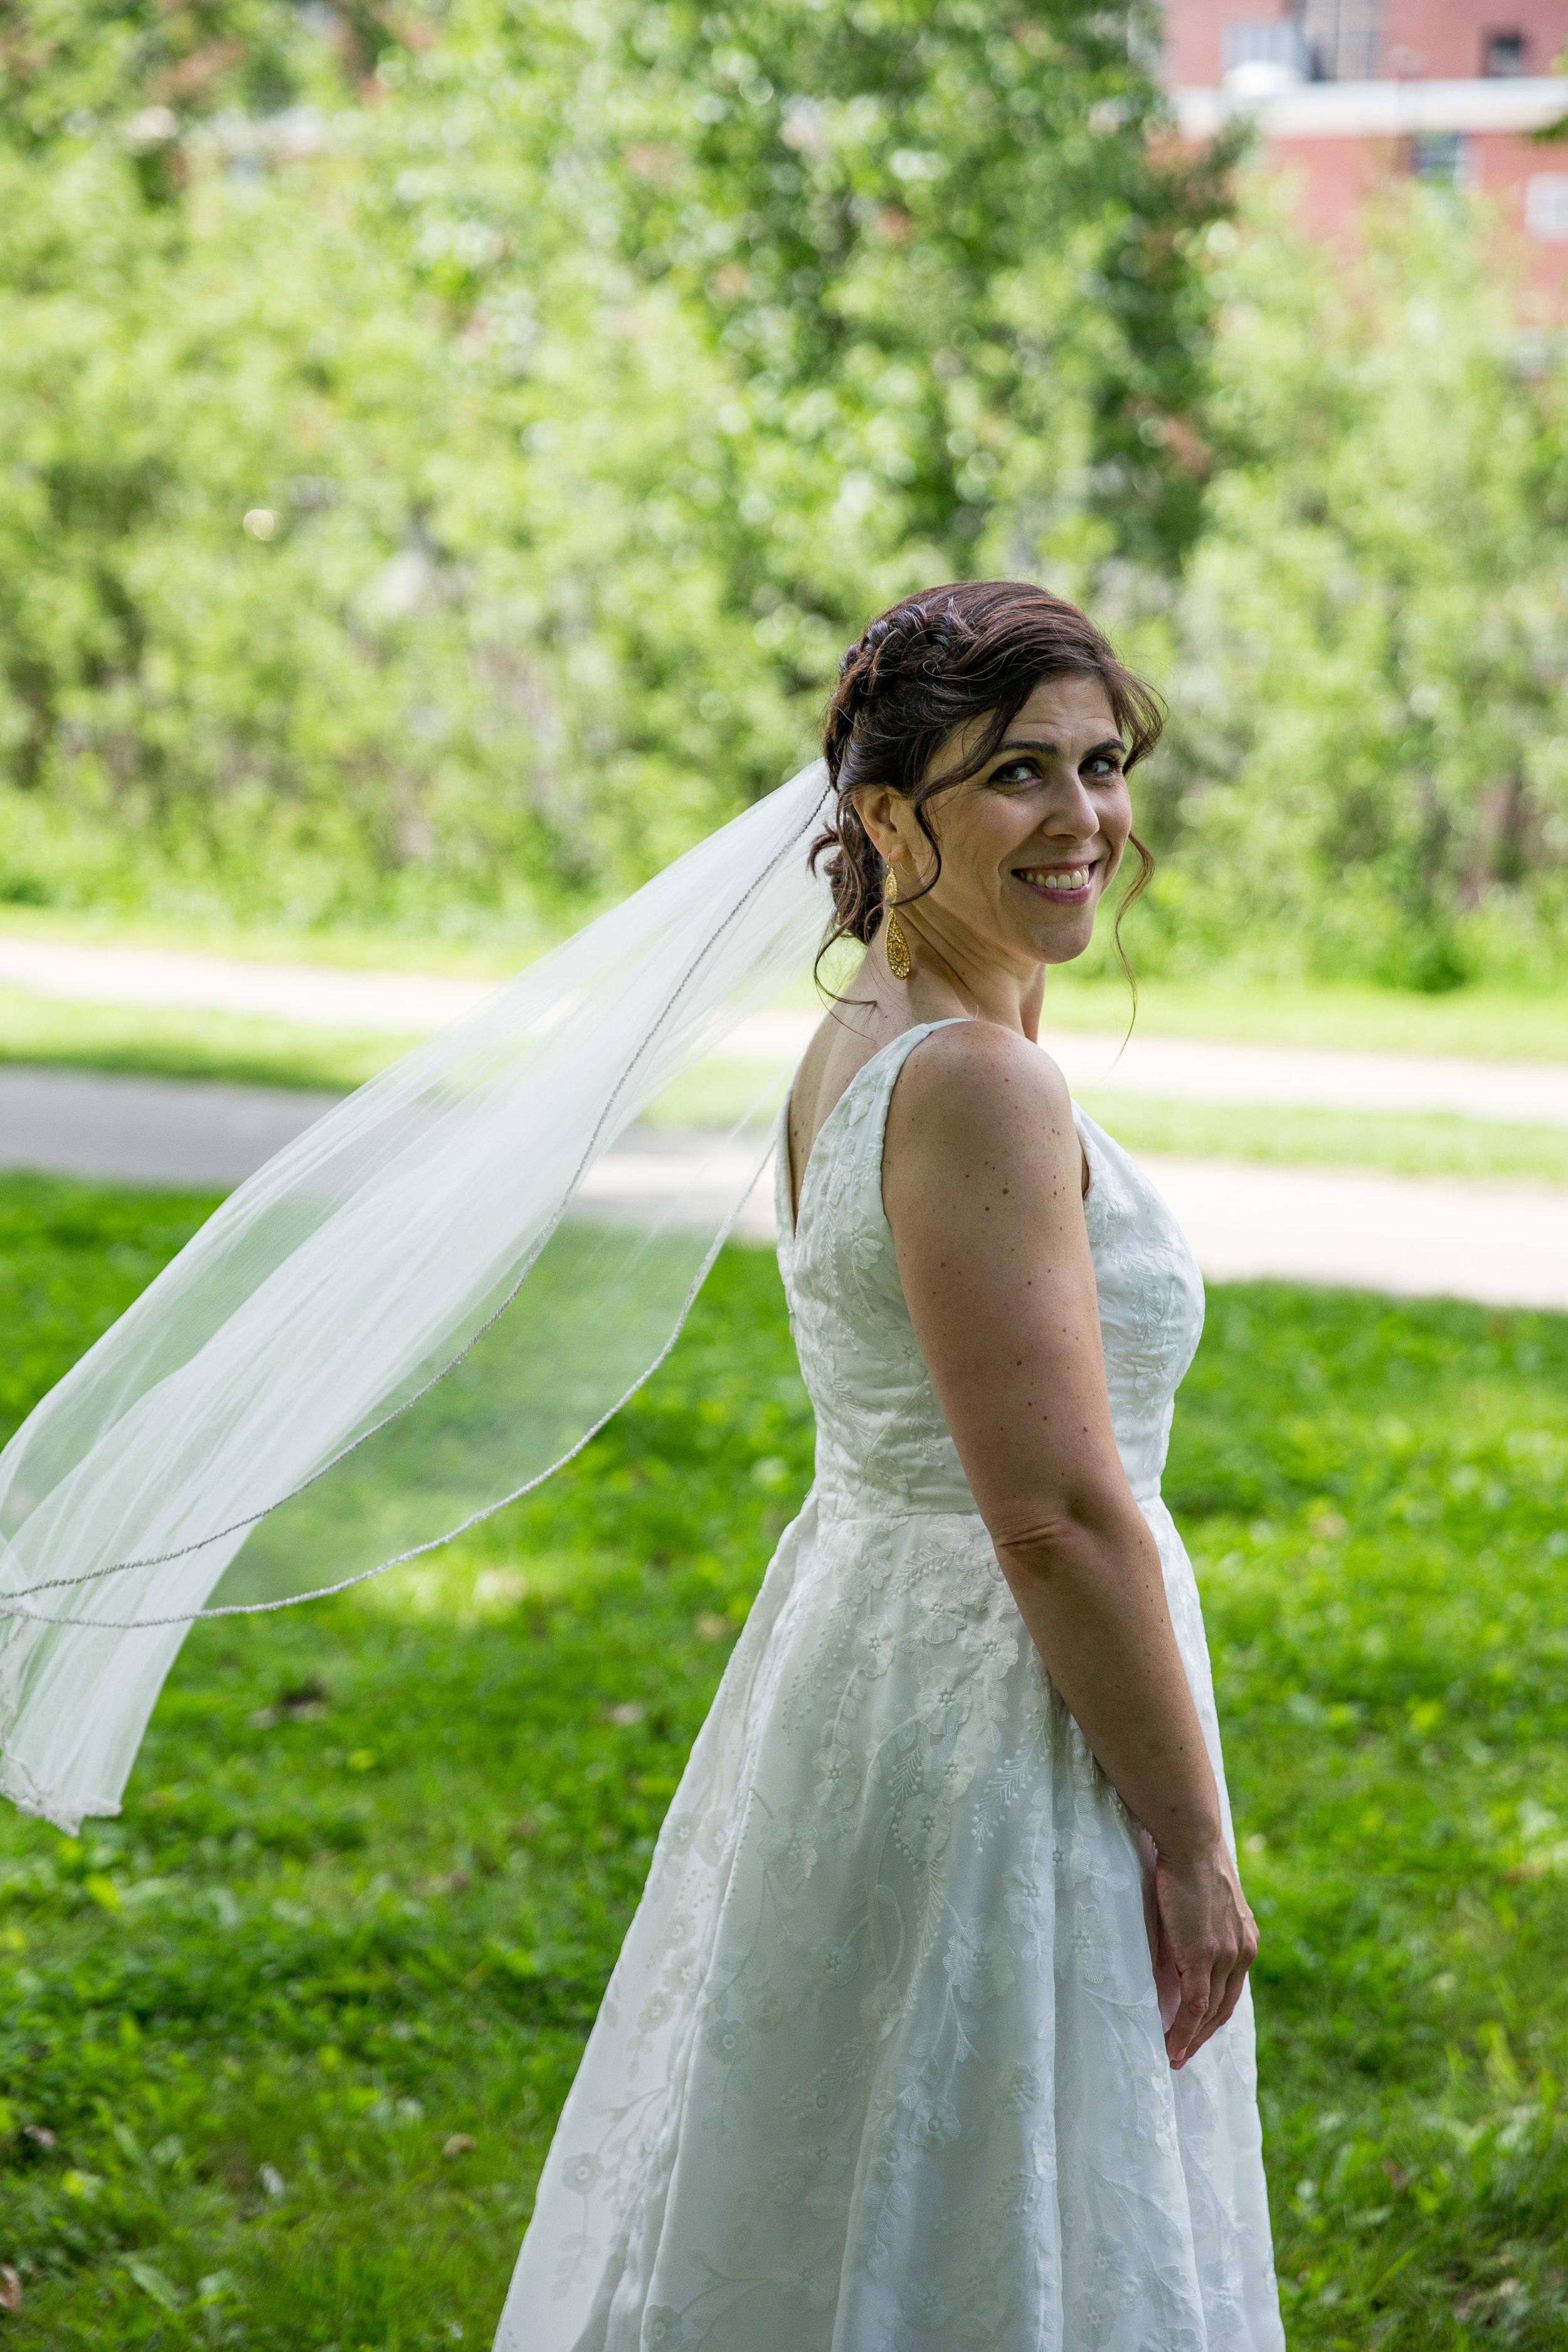 Natalie and Dallas Mooney Wedding 6-8-19_Tania Watt Photography-283.jpg